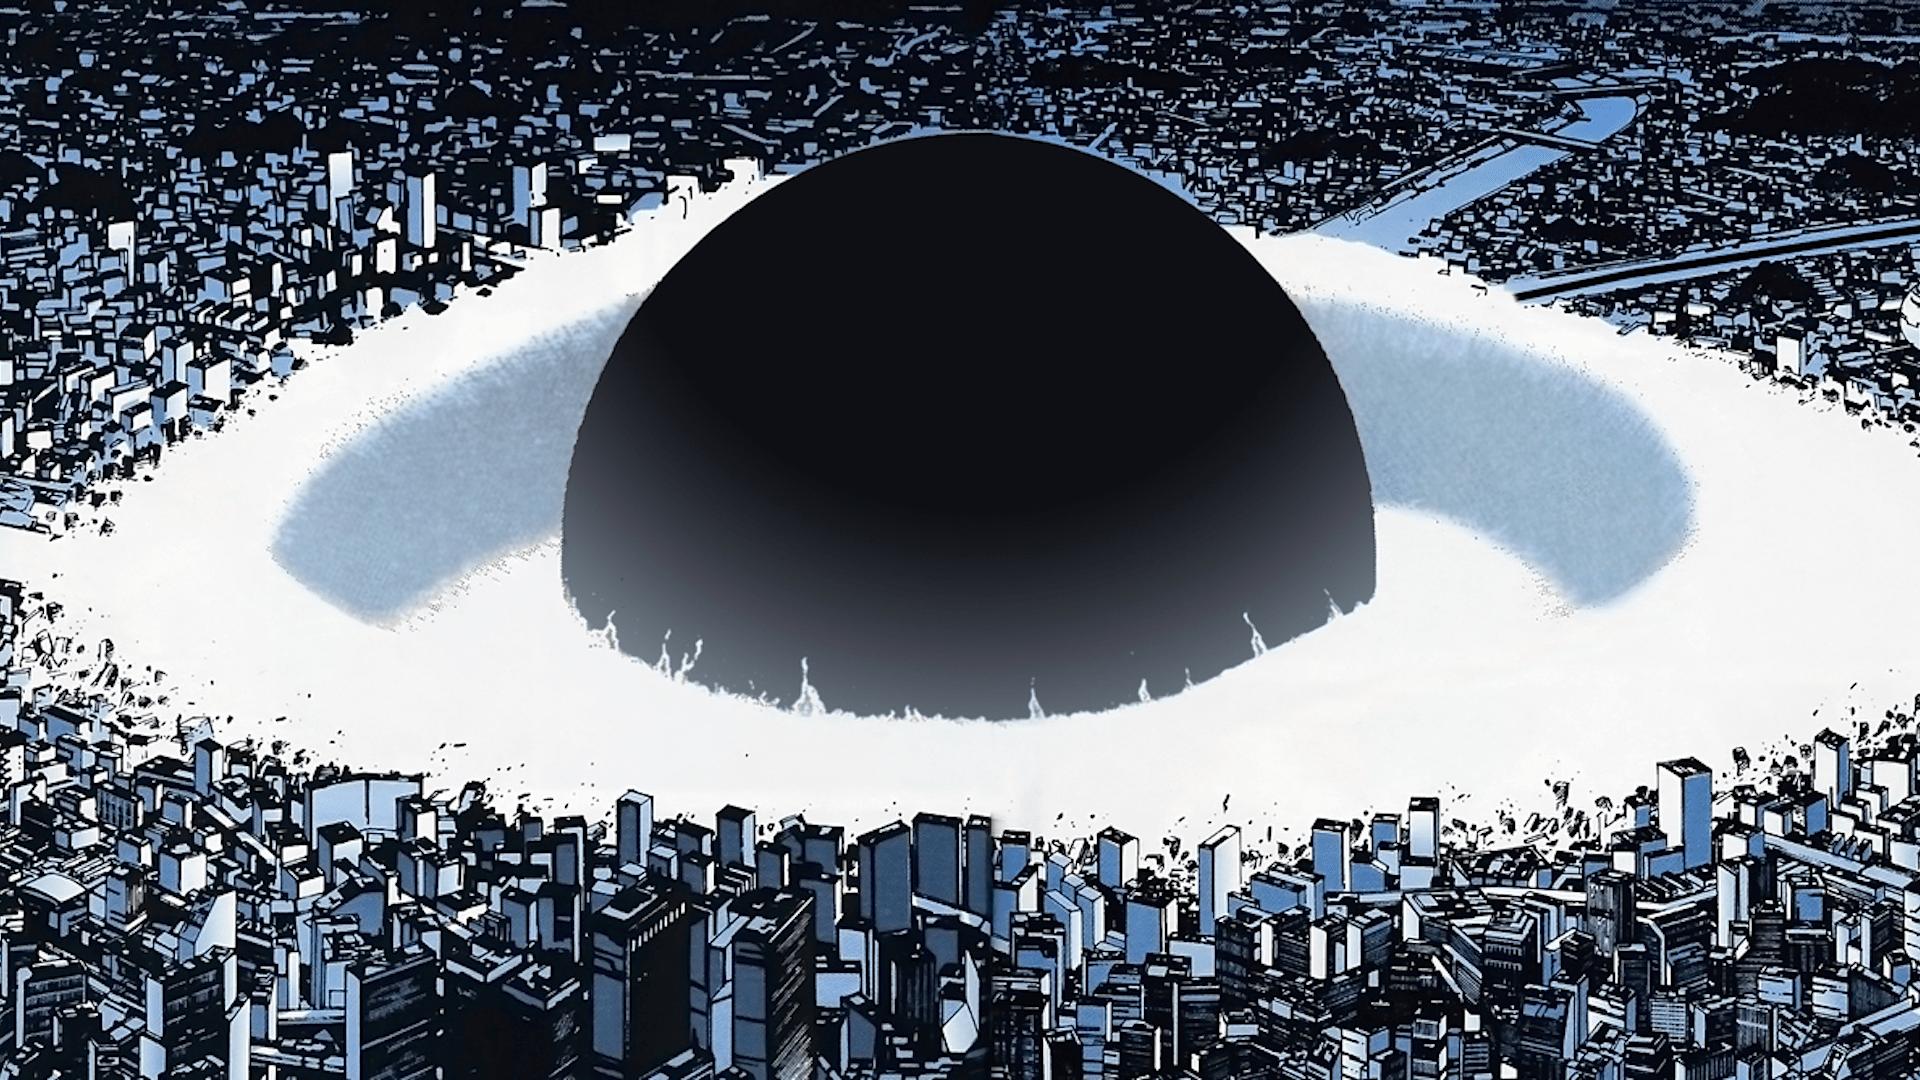 [1920x1080] Akira Explosion HD Wallpaper Art ludique